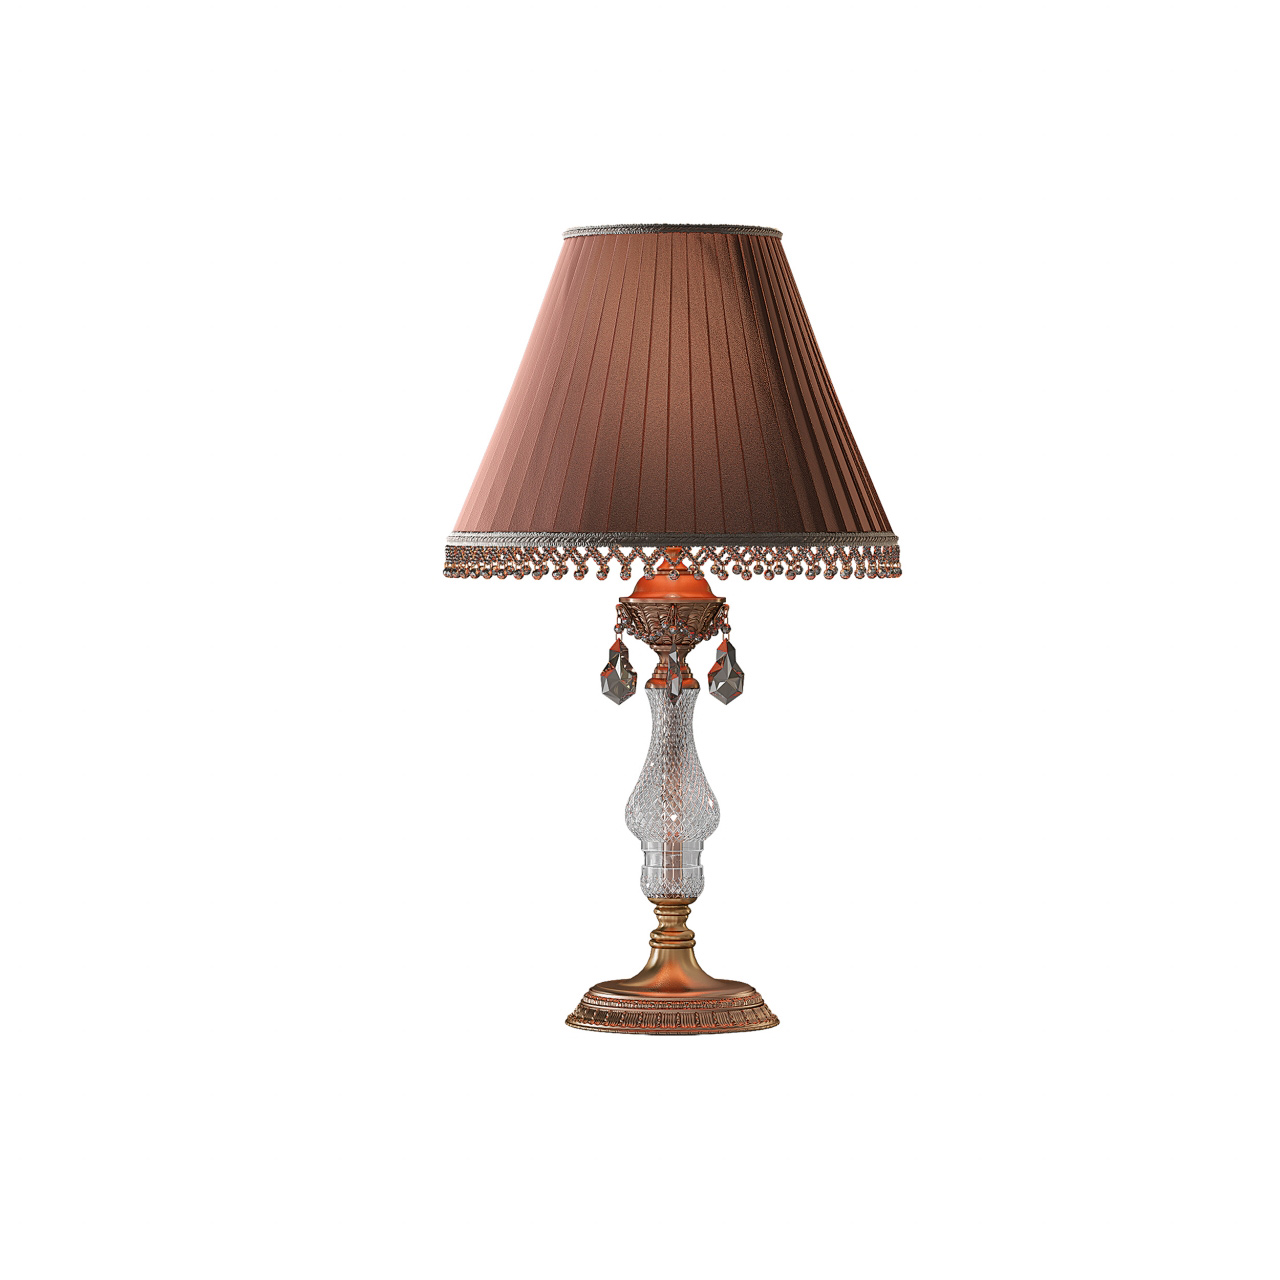 Настольная лампа Ampollo 1х40W E27 coffee gold Osgona 786912